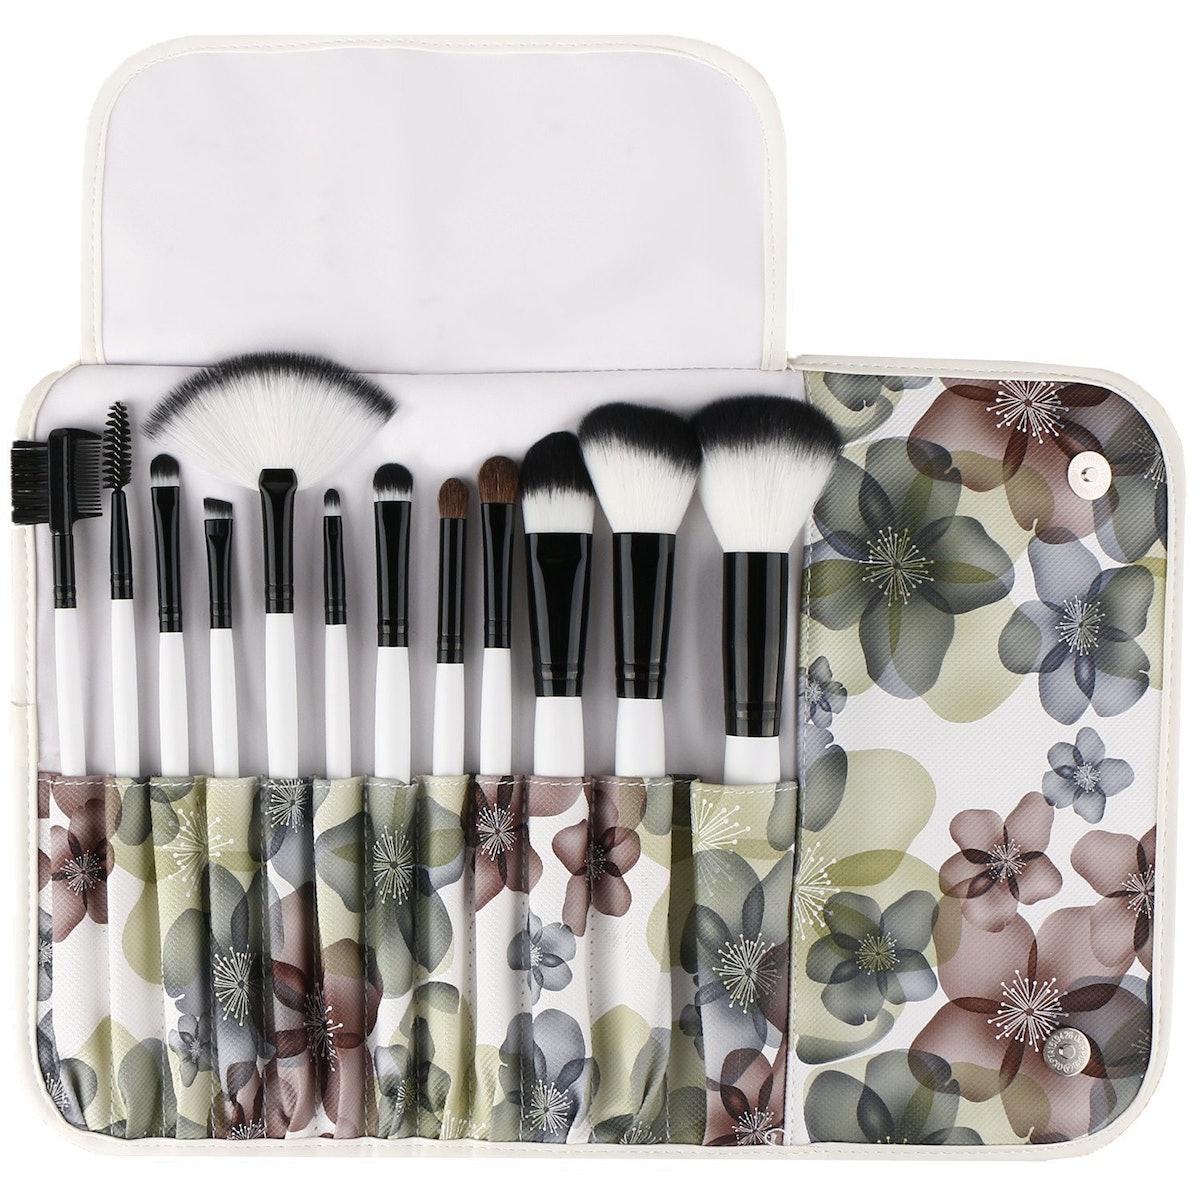 UNIMEIX 12-Piece Premium Makeup Brush Set